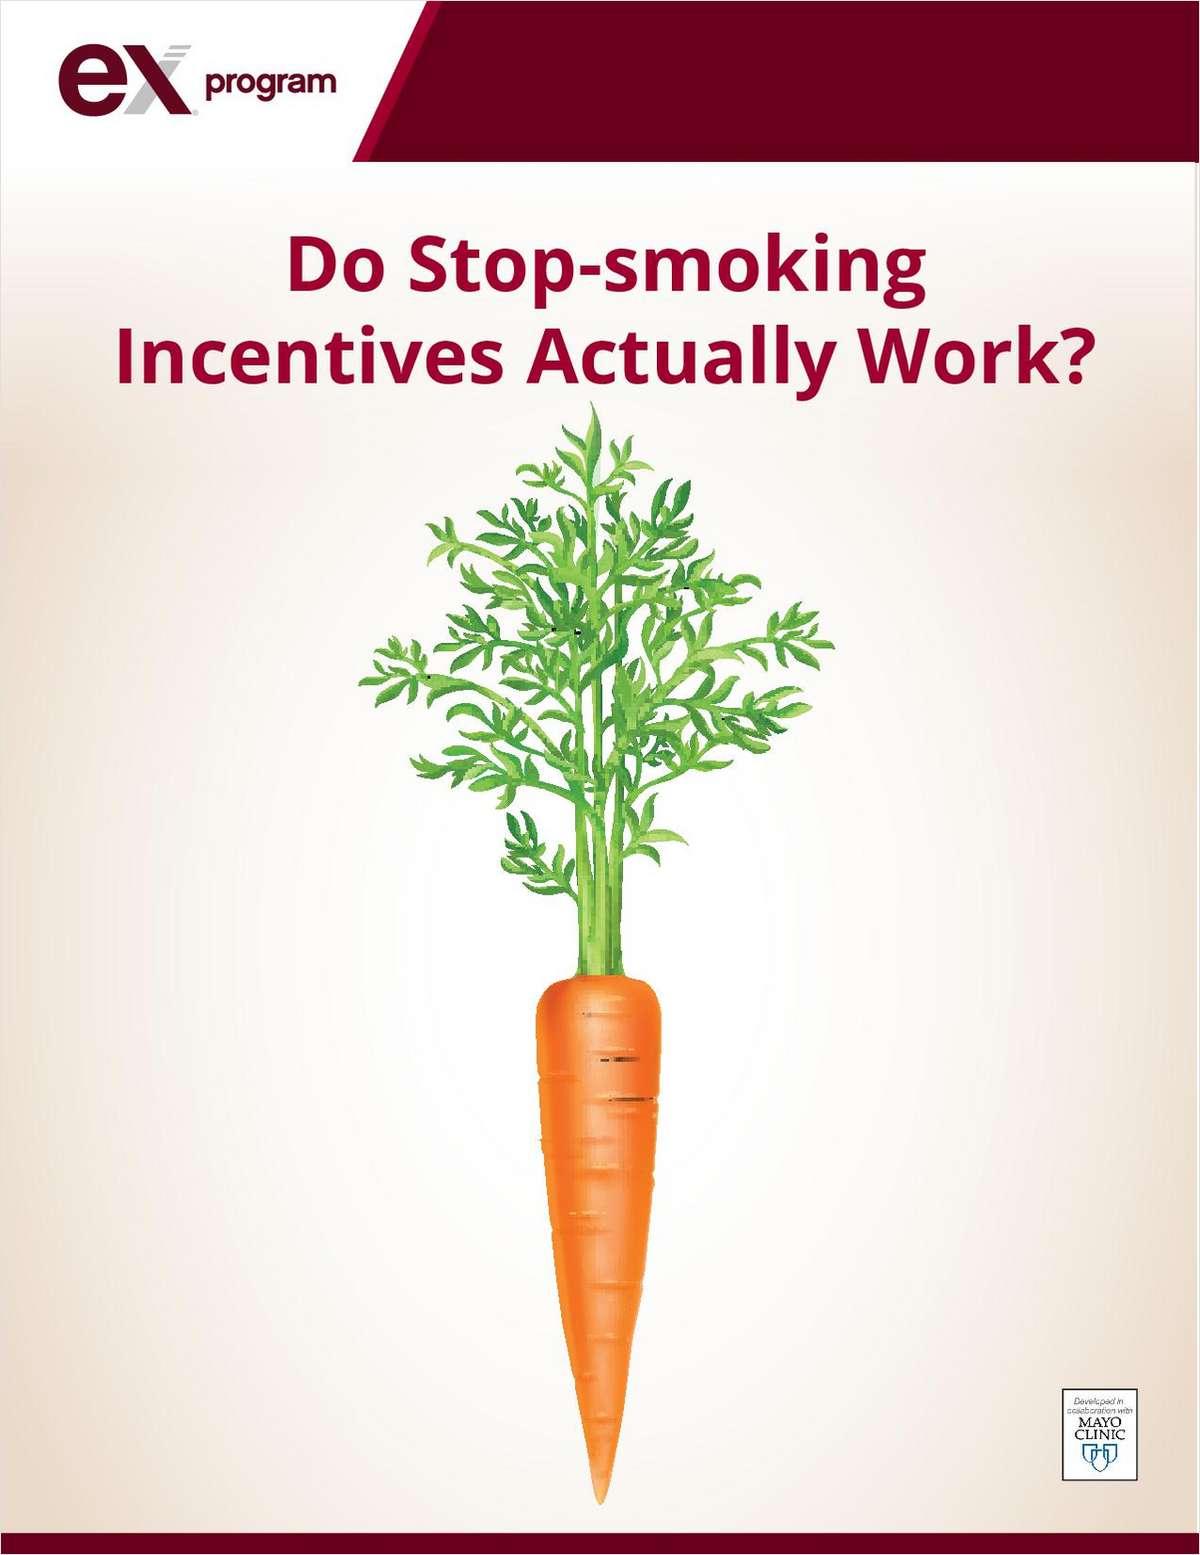 Do Stop-Smoking Incentives Actually Work?